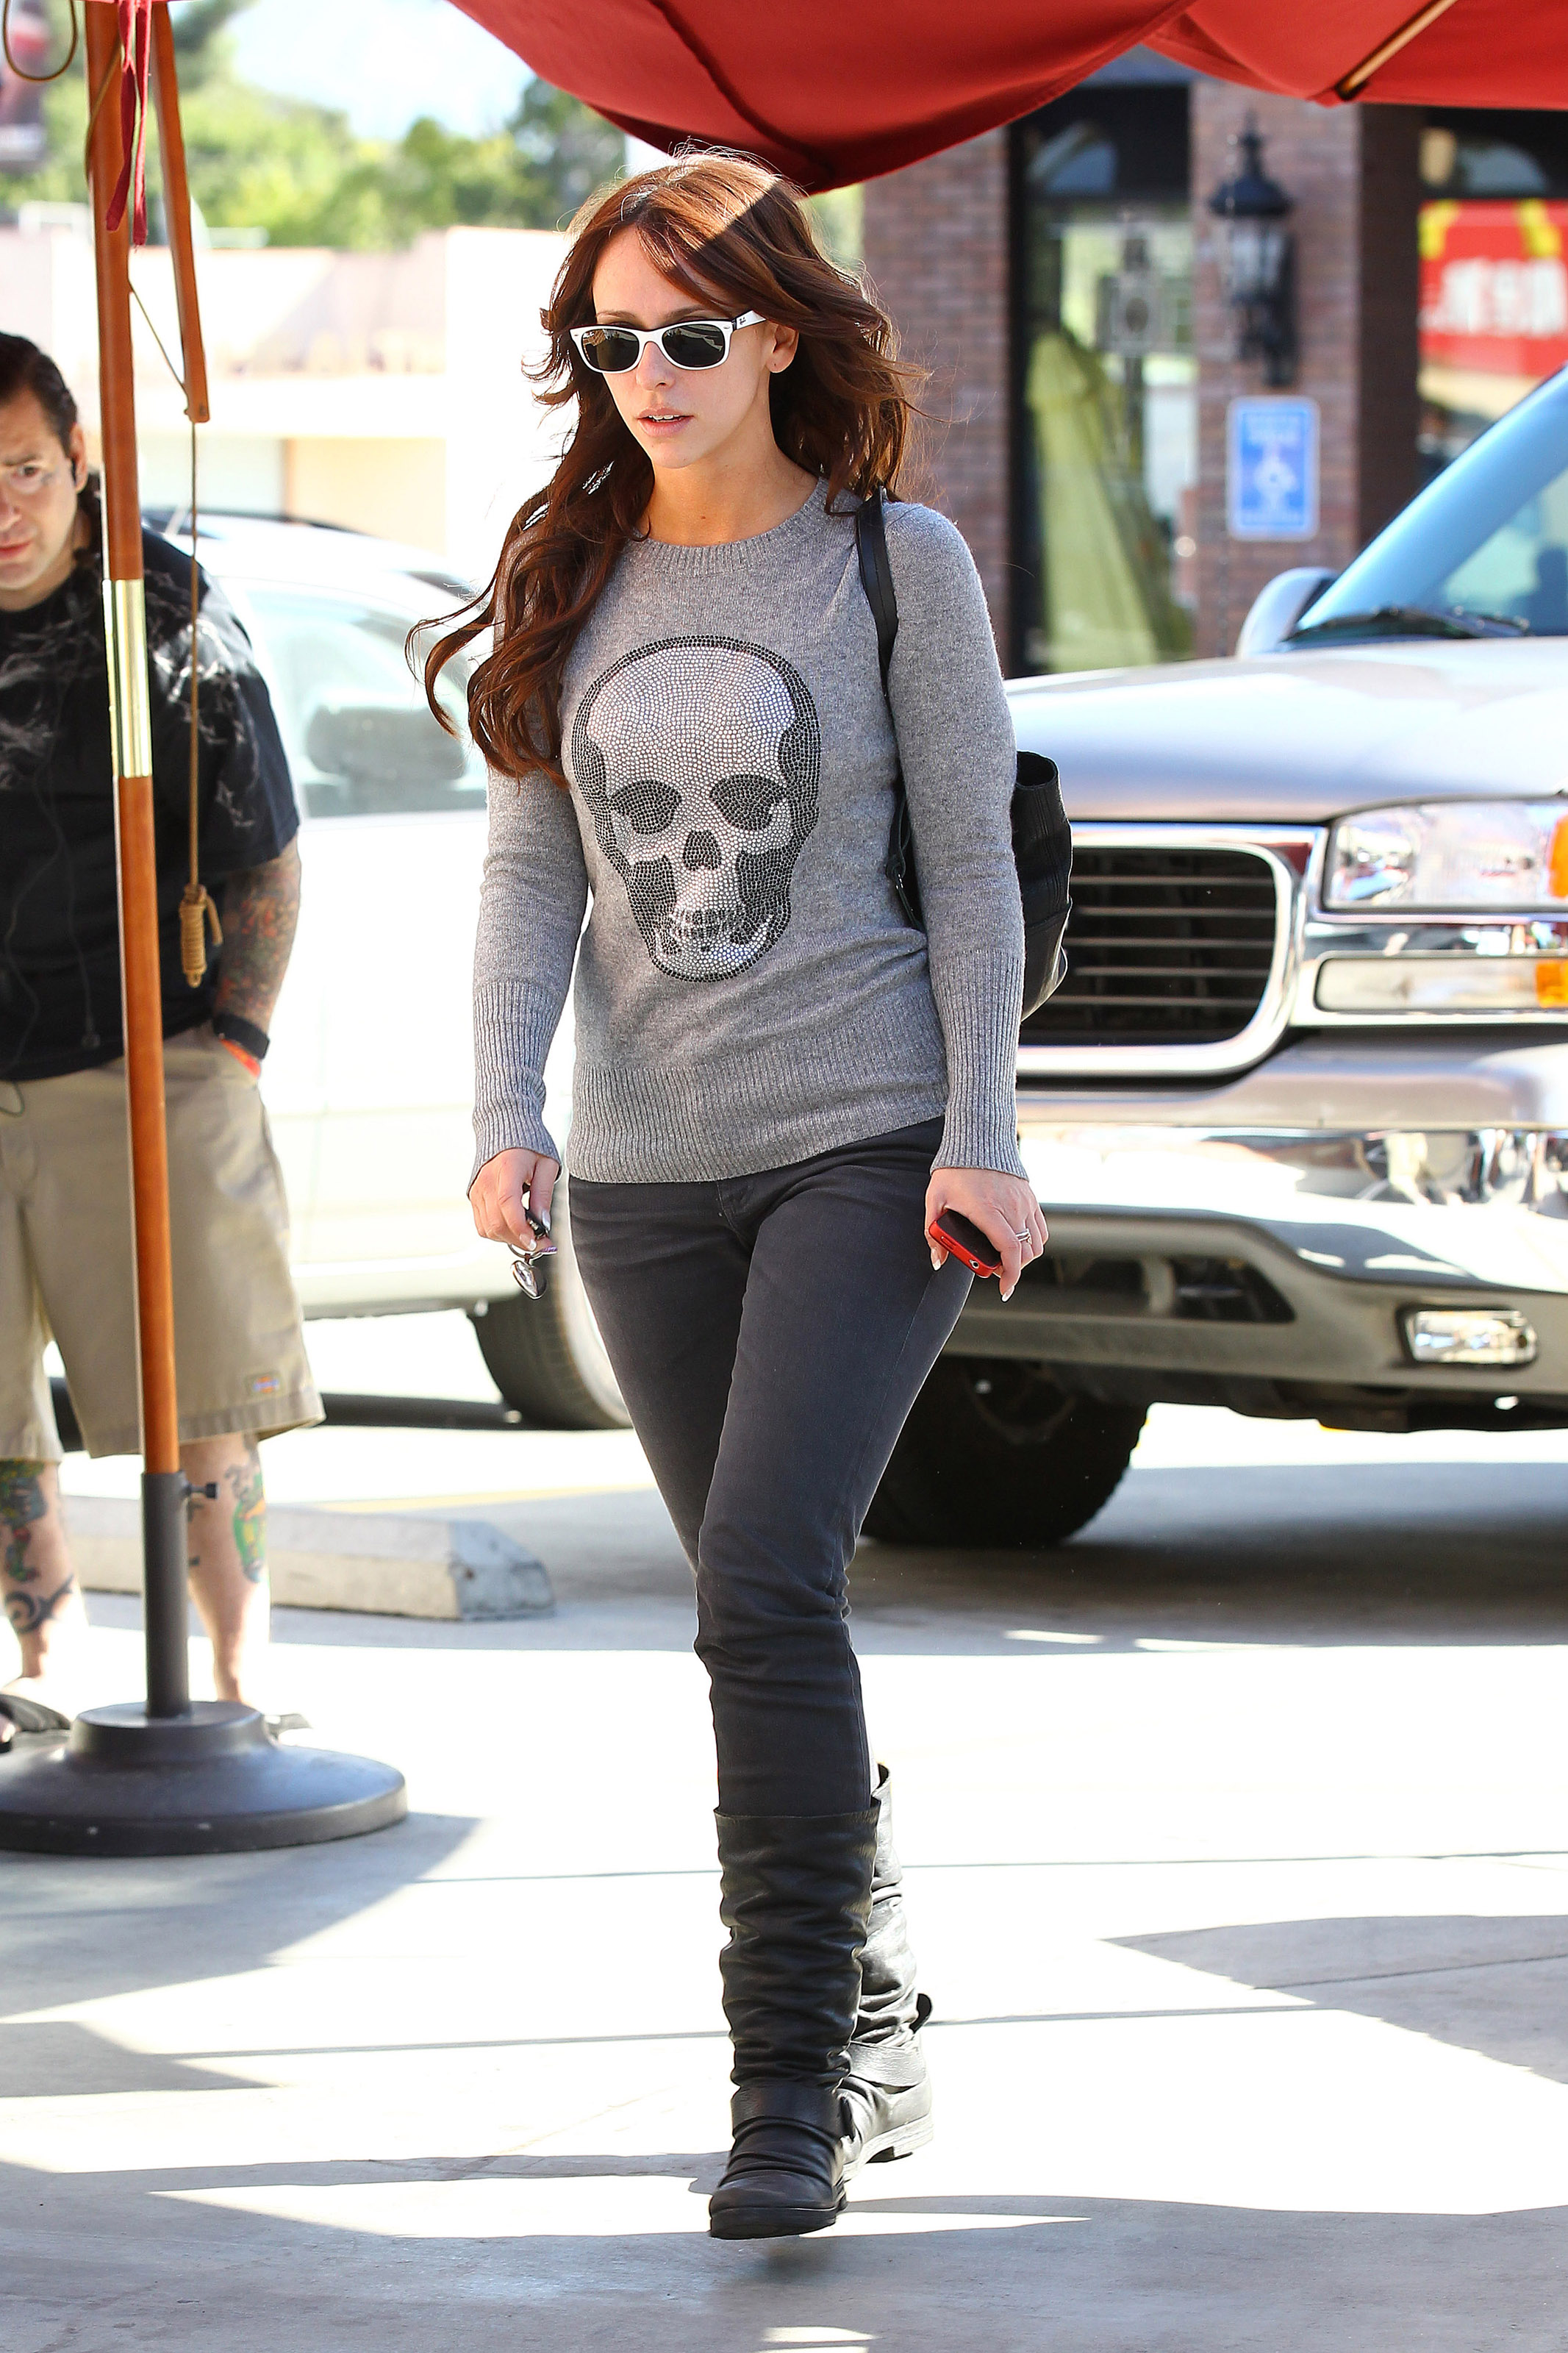 Jennifer Love Hewitt Tight Jeans Candids In La 03 Gotceleb